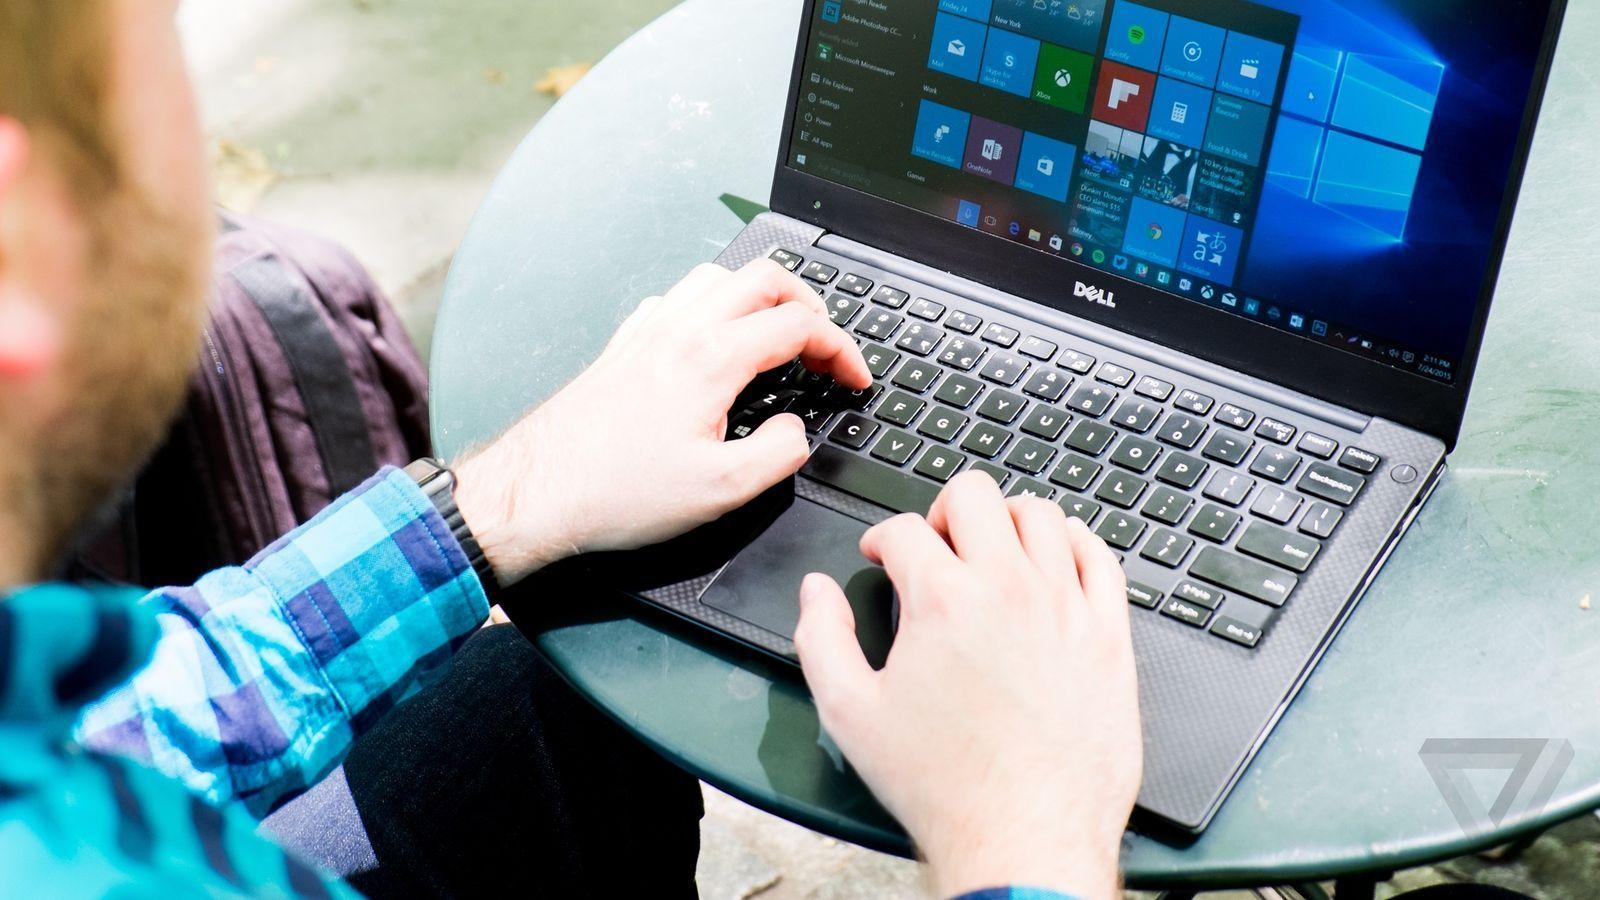 Microsoft testing app that unlocks Windows 10 PCs over